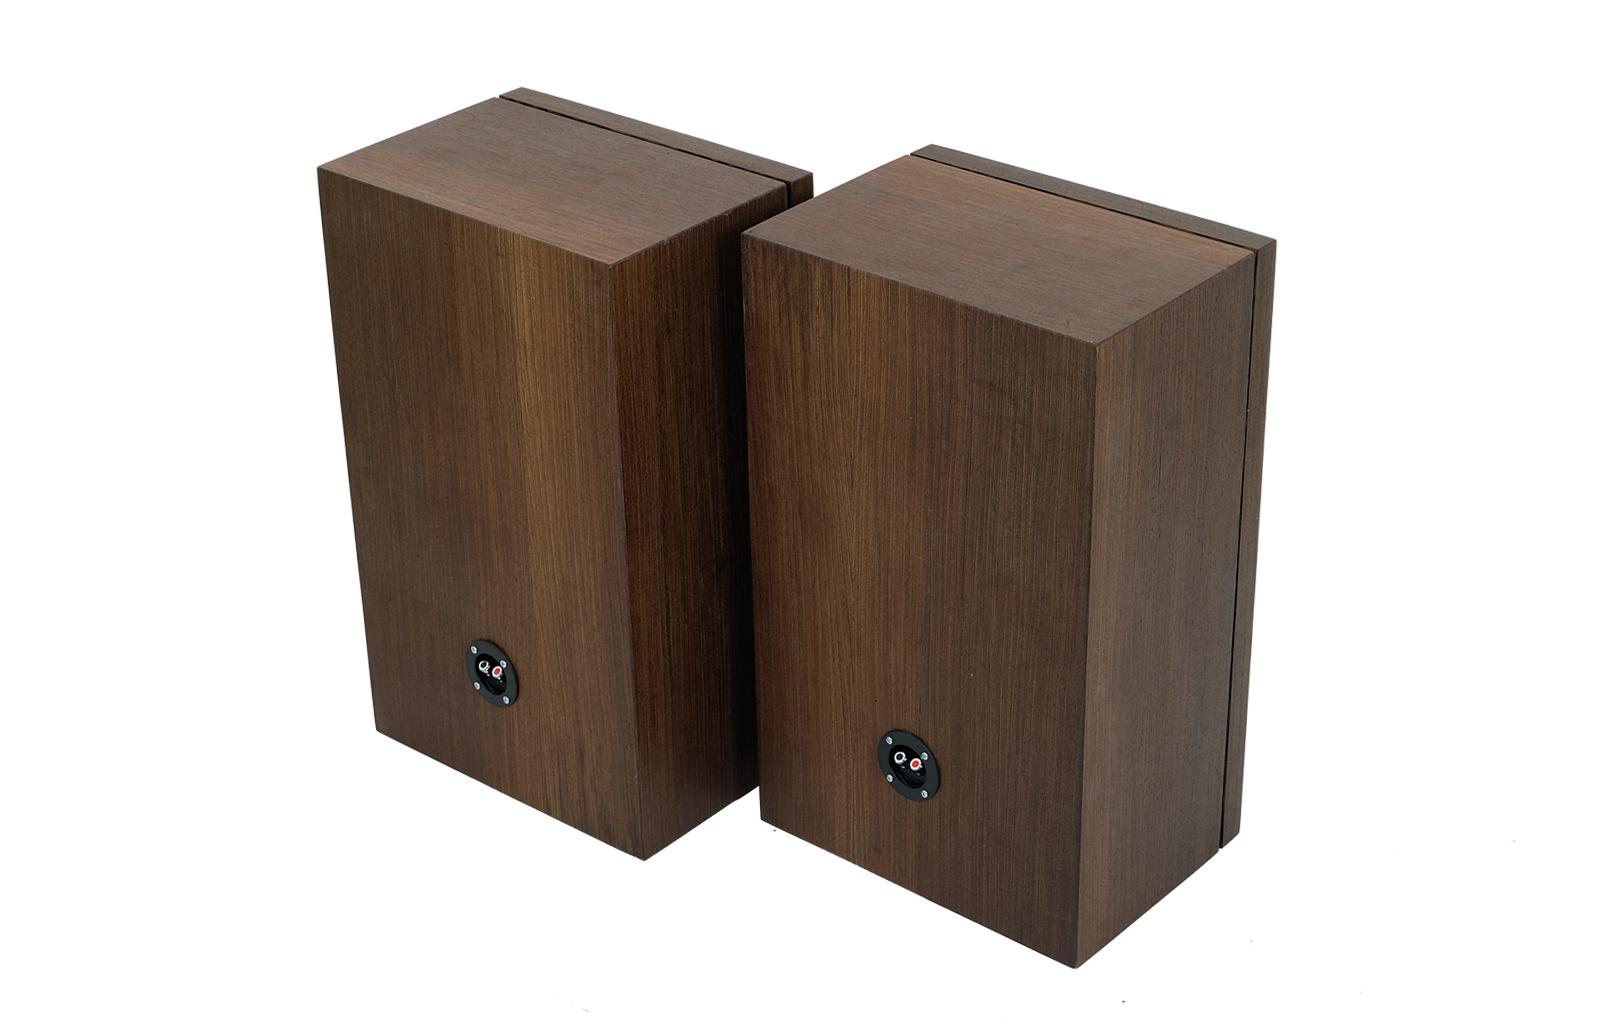 Interaudio Speakers Model 4000